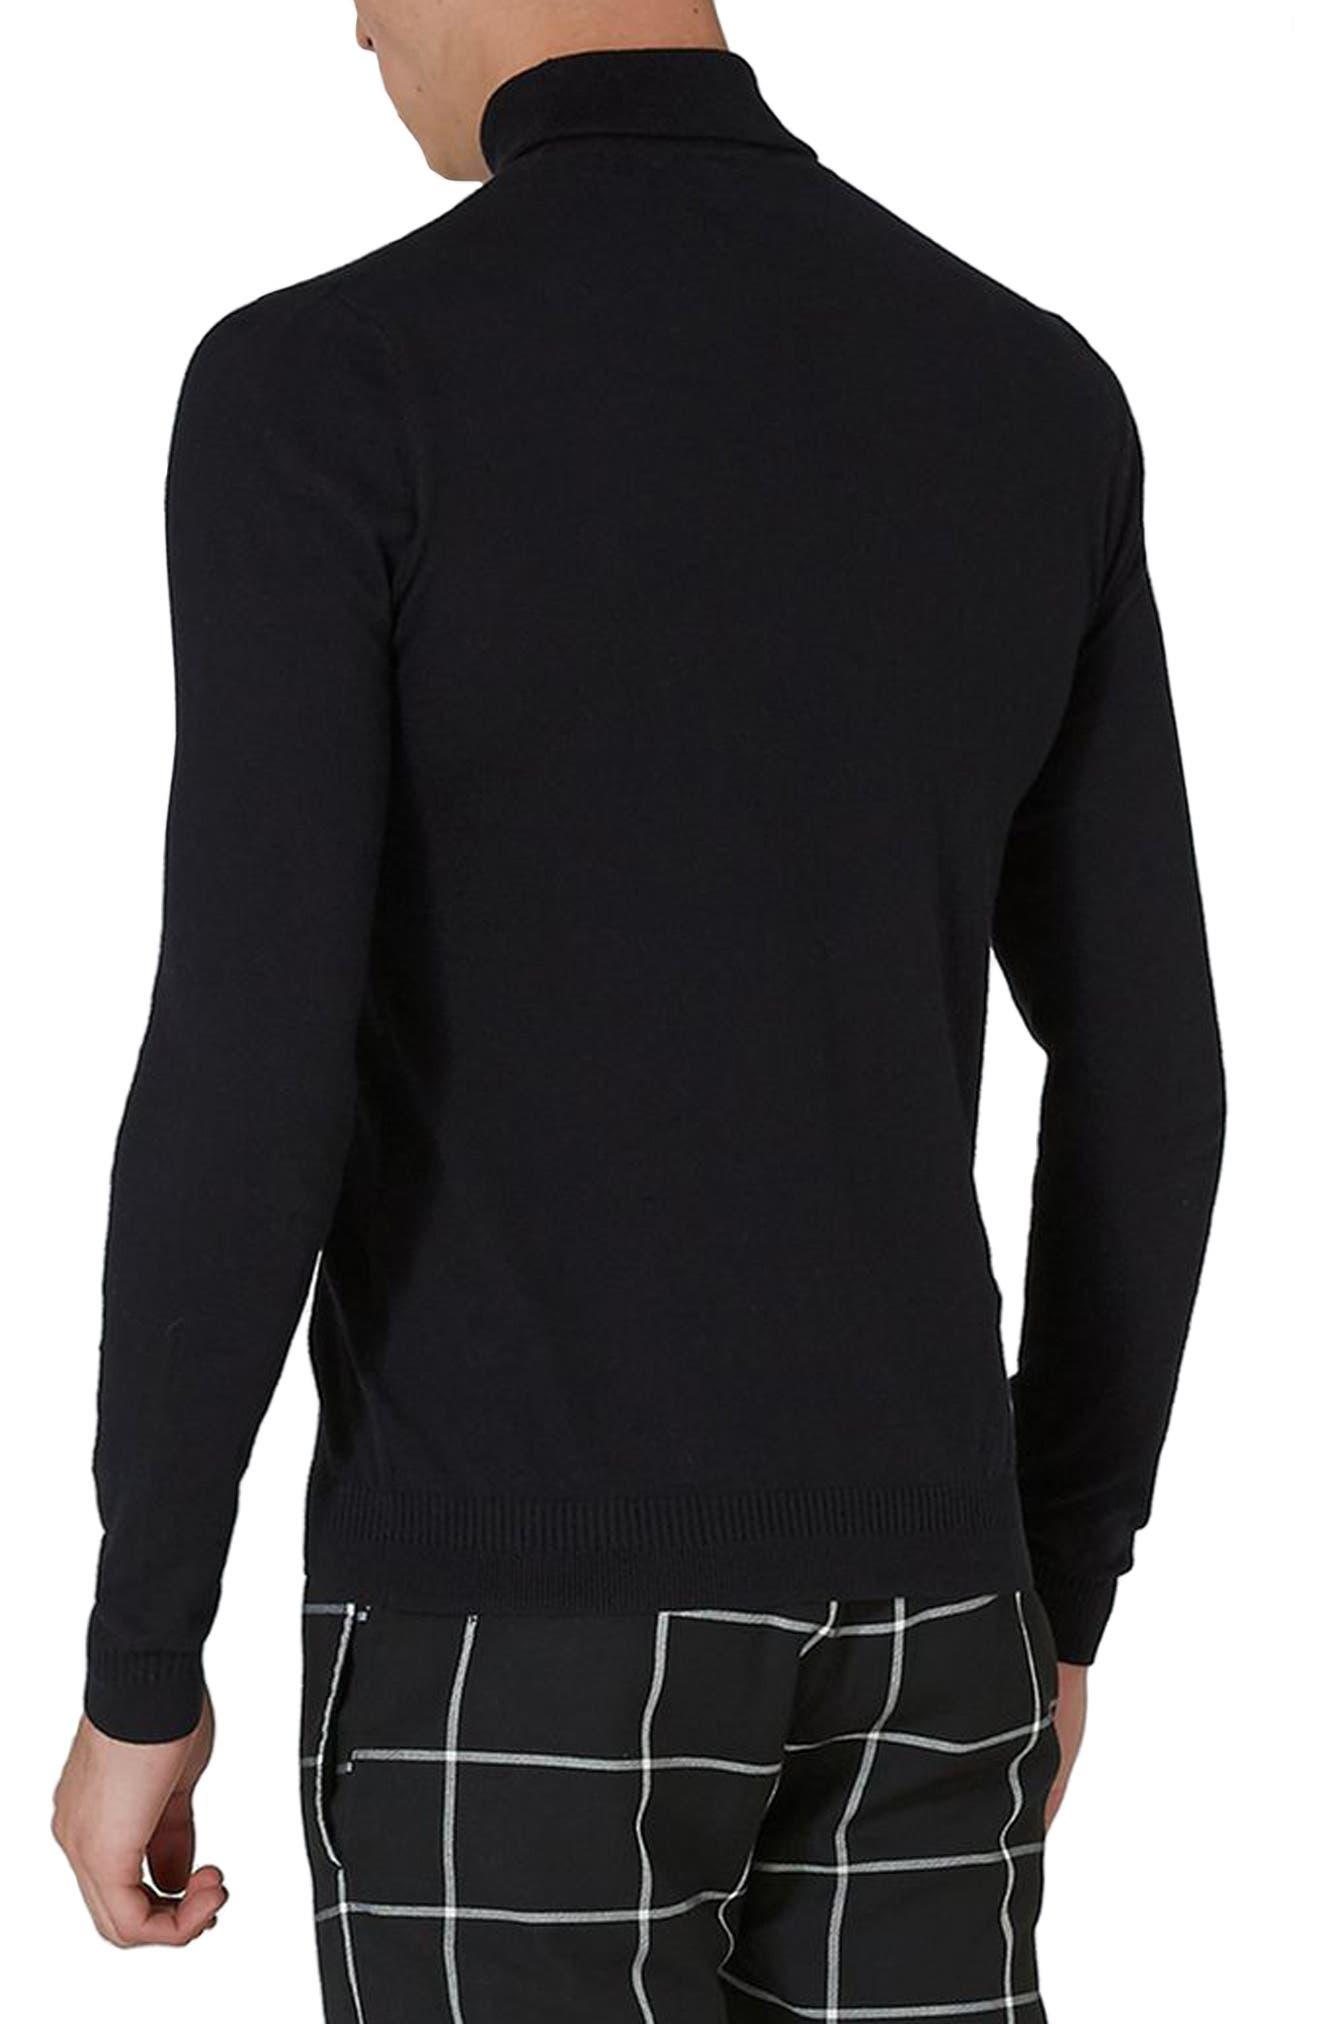 Cotton Turtleneck Sweater,                             Alternate thumbnail 2, color,                             001